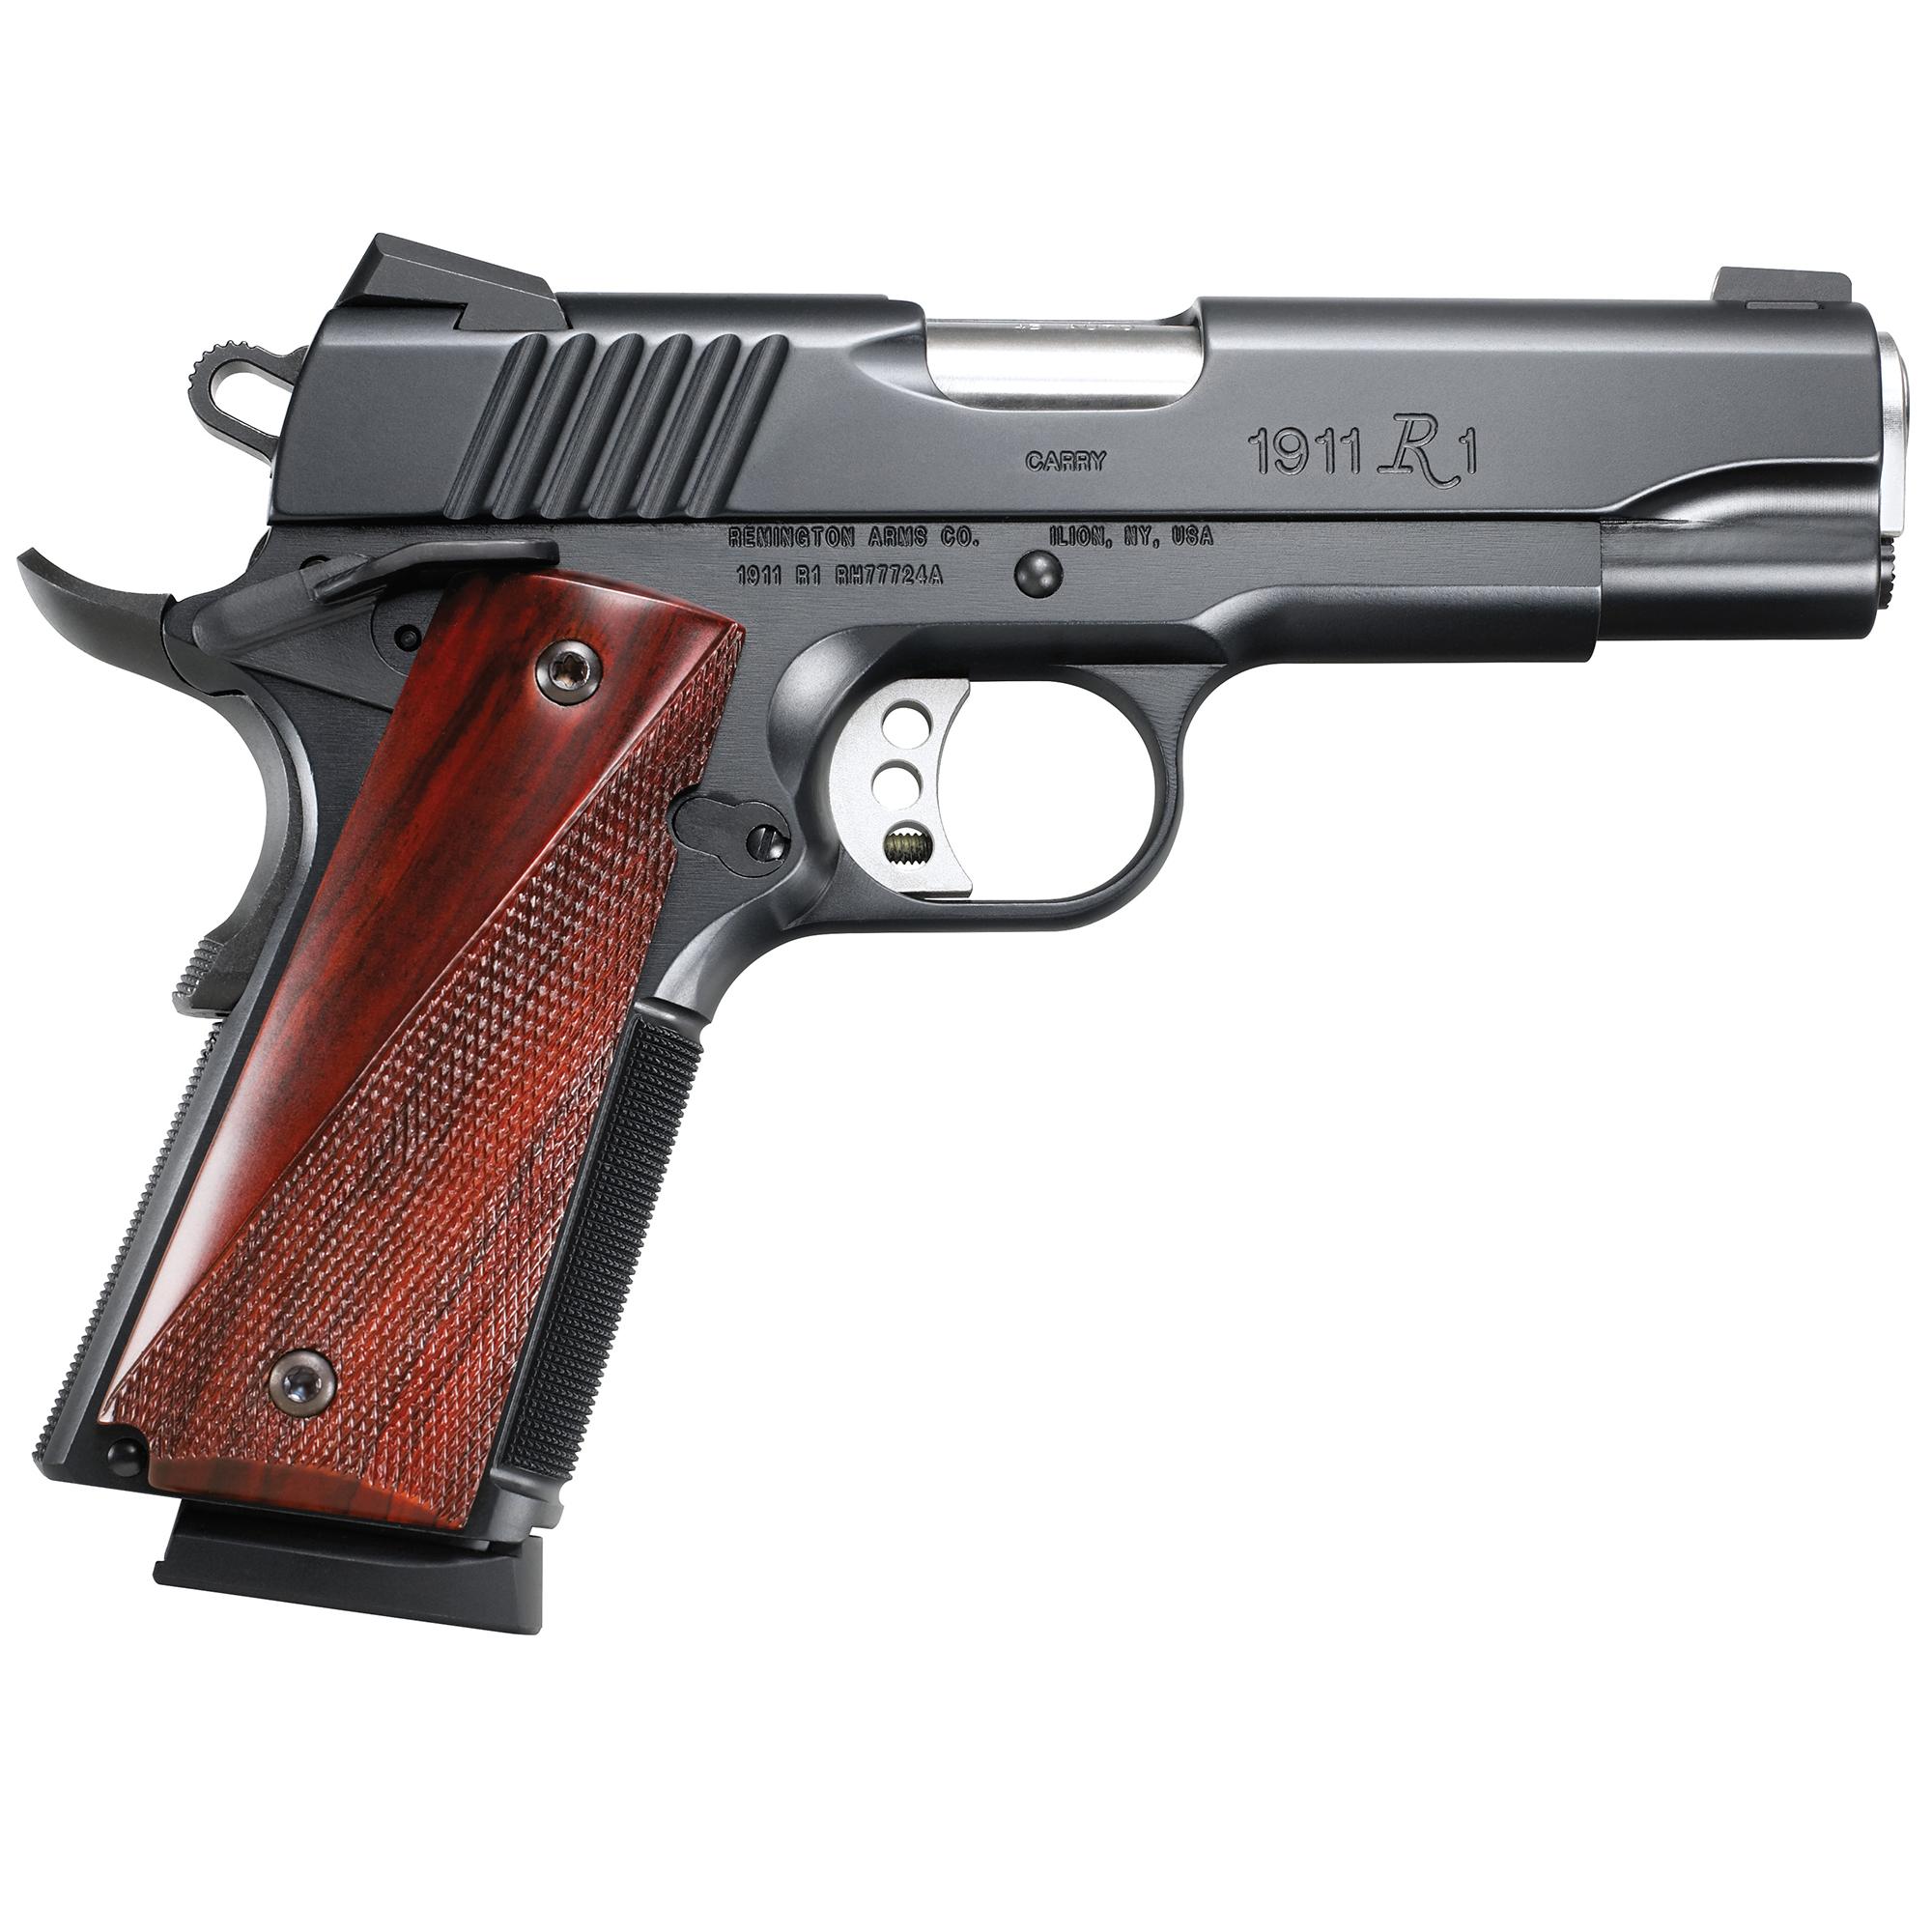 Remington 1911 R1 Carry Commander Handgun